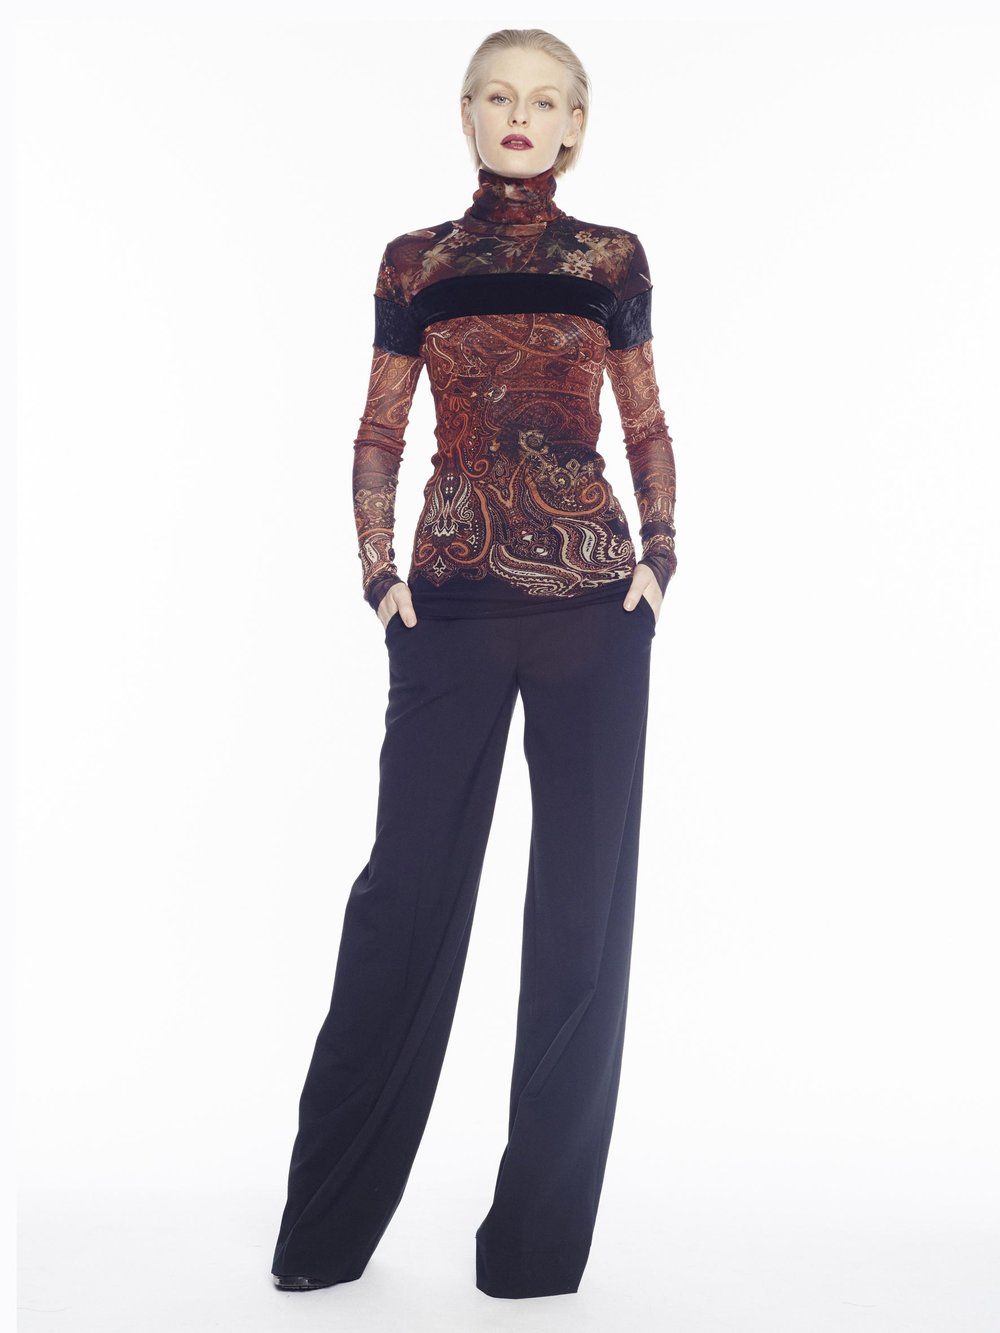 F71589 t-shirt c/alto m/l - F71939 pantalone